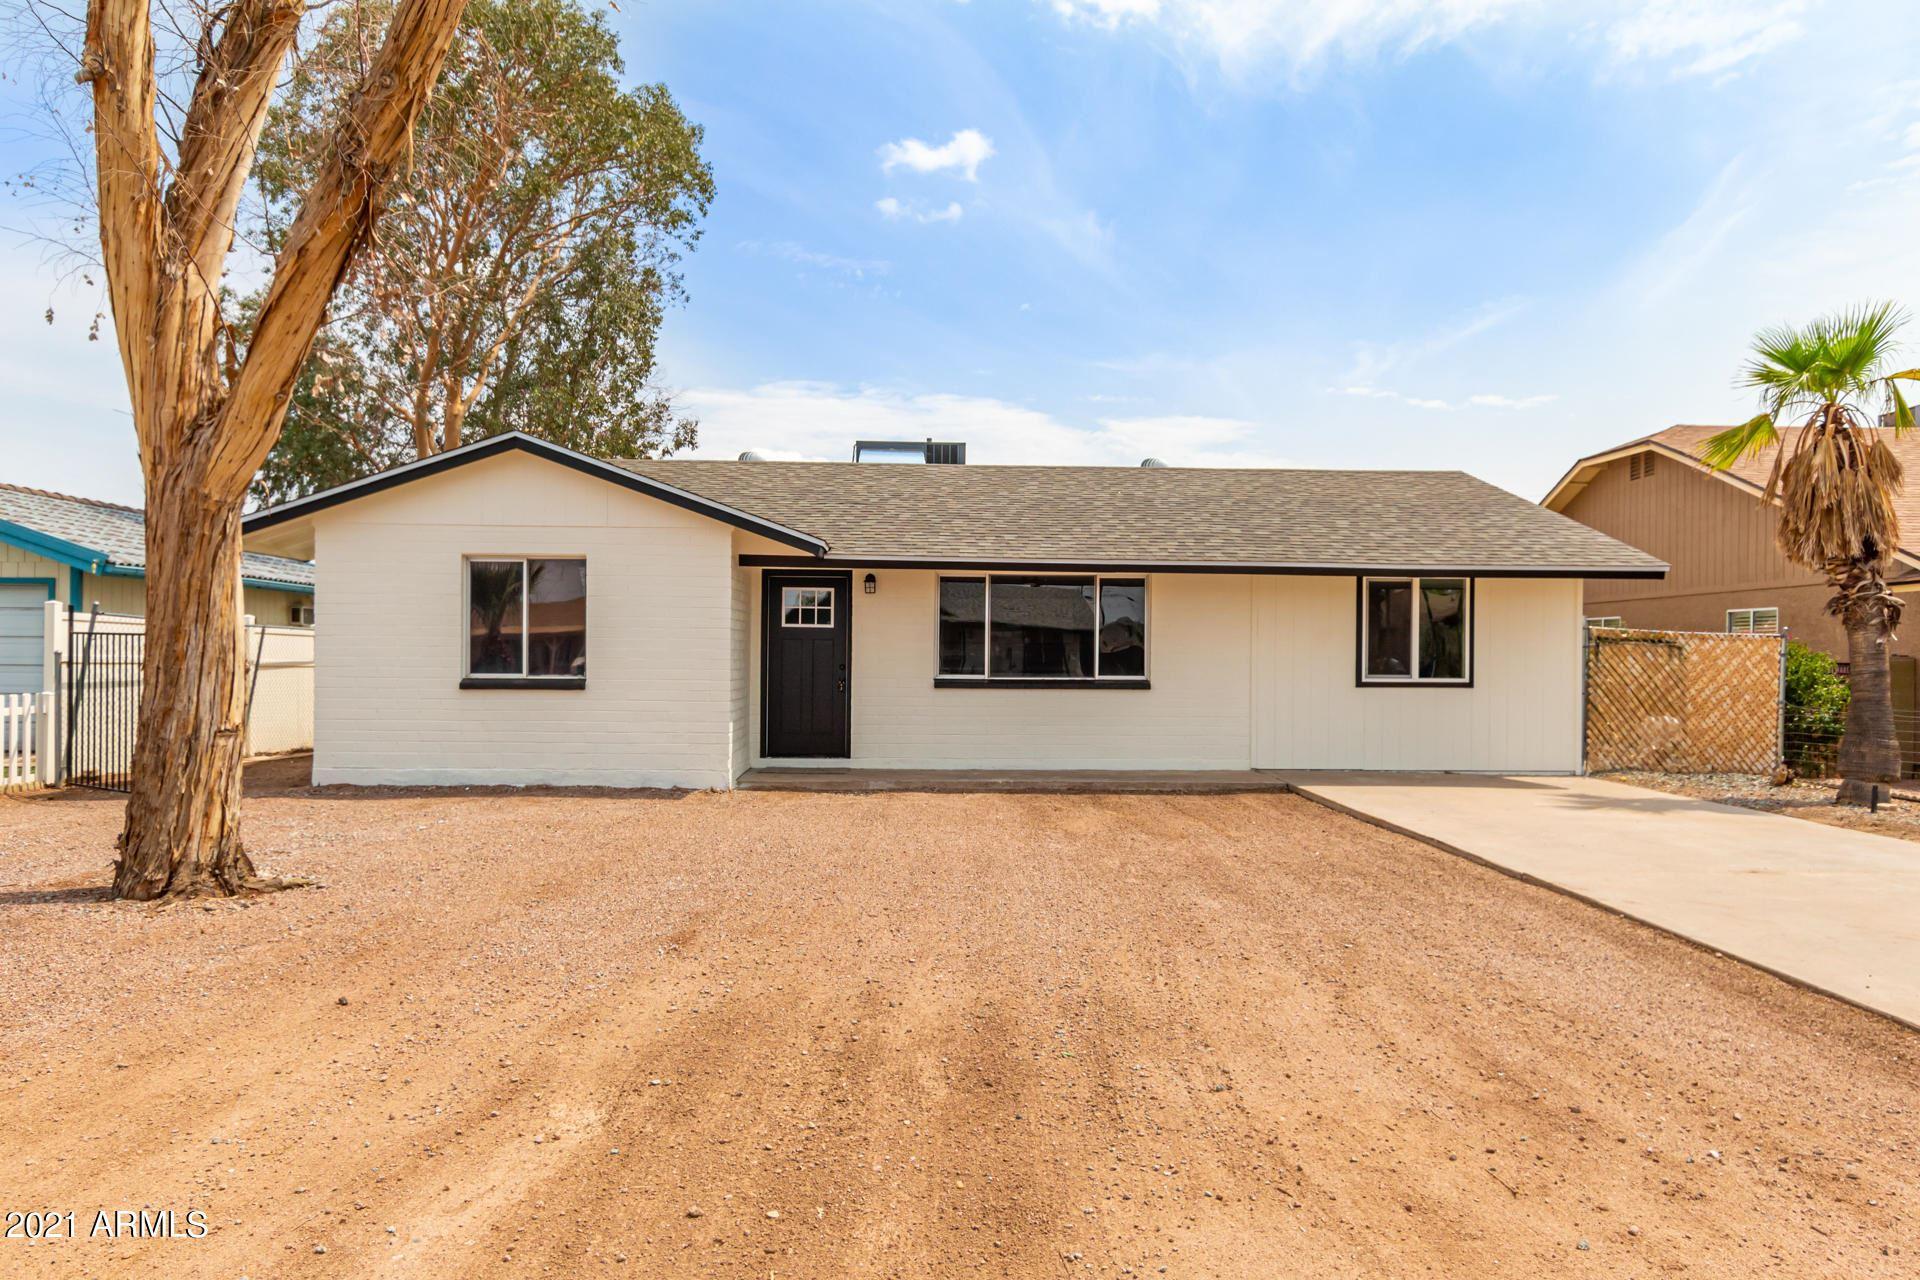 Photo of 535 E FRED Avenue, Apache Junction, AZ 85119 (MLS # 6265648)